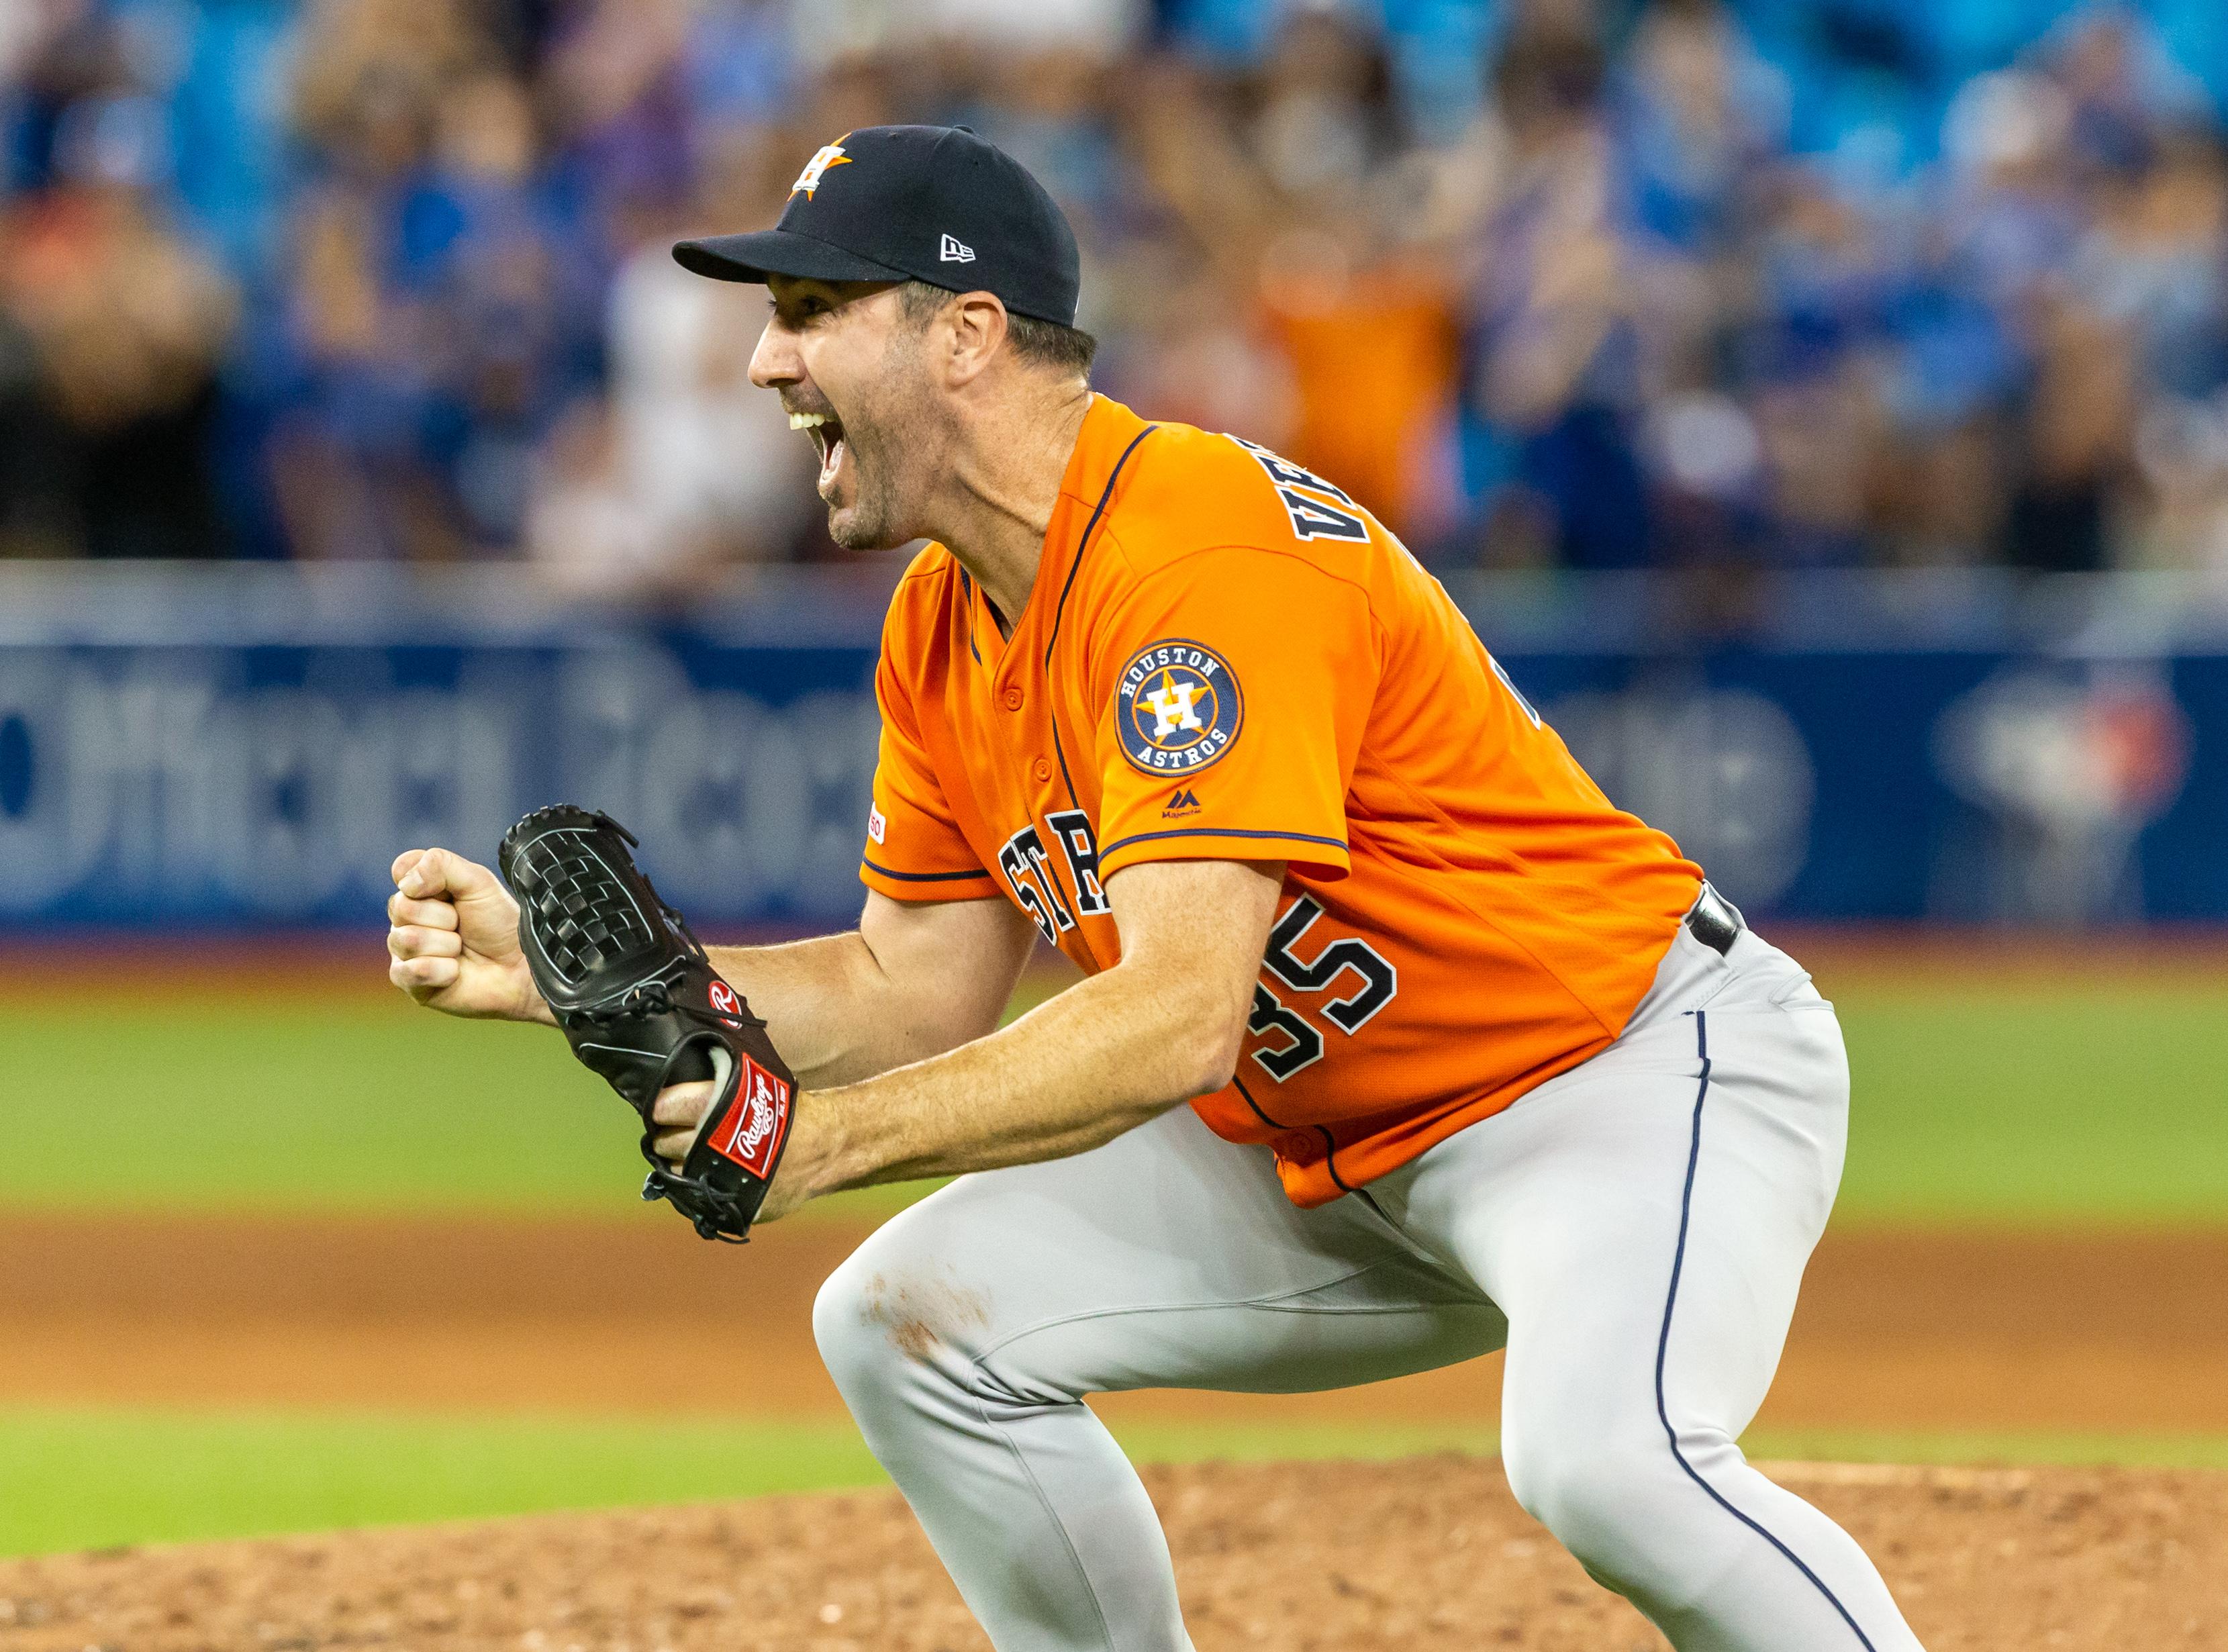 Justin Verlander notches third career no hitter in 2-0 Astros win over Blue Jays